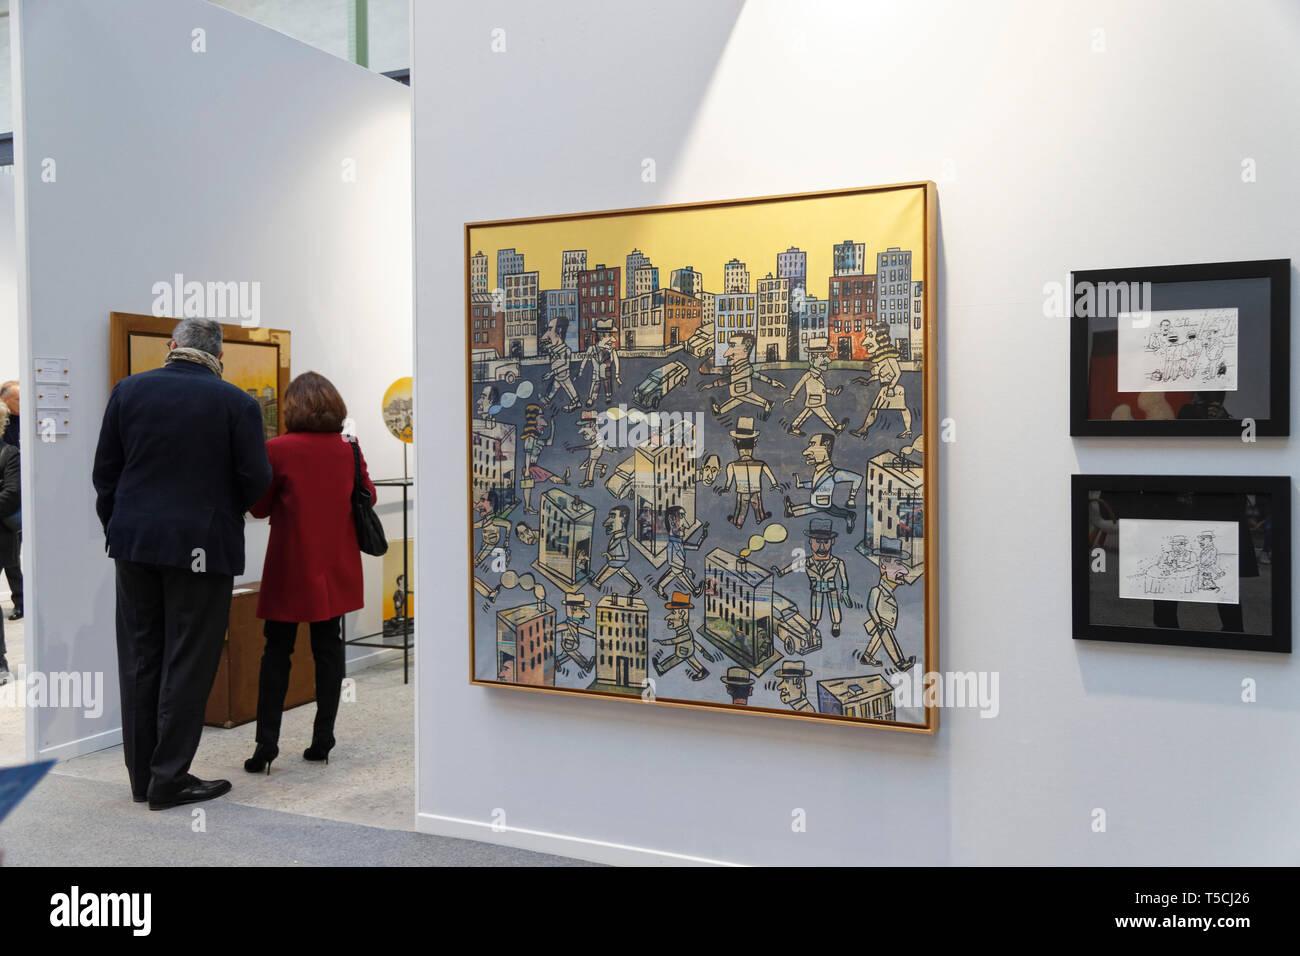 Paris, France. 3th April, 2019. Antonio Segui exibited at Paris Art Fair, Paris, 2019, France. Credit: Veronique Phitoussi/Alamy Stock Photo Stock Photo